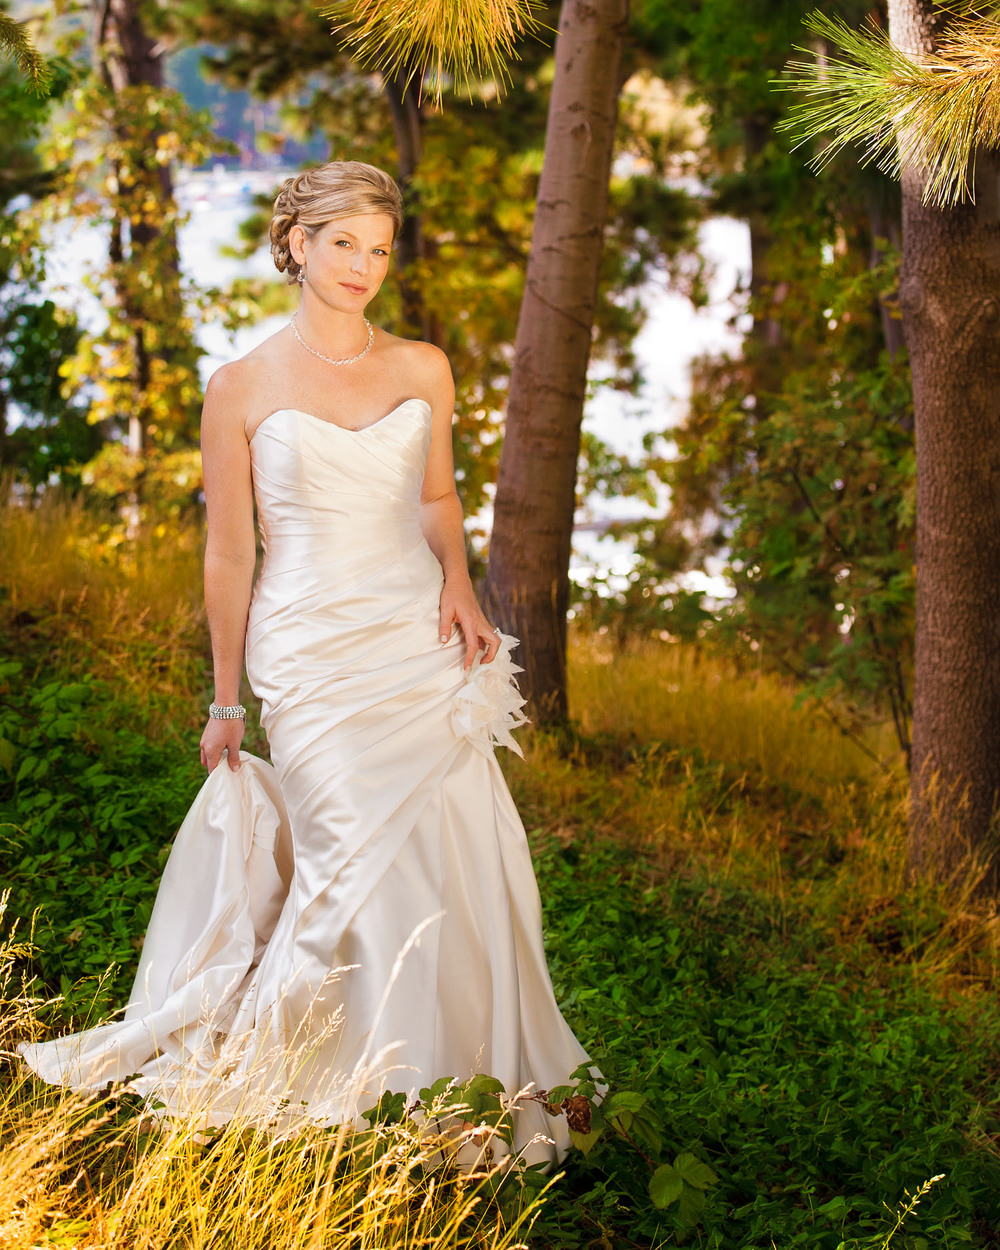 stewart_bertrand_wedding_photography_cwblogwed-1002.jpg